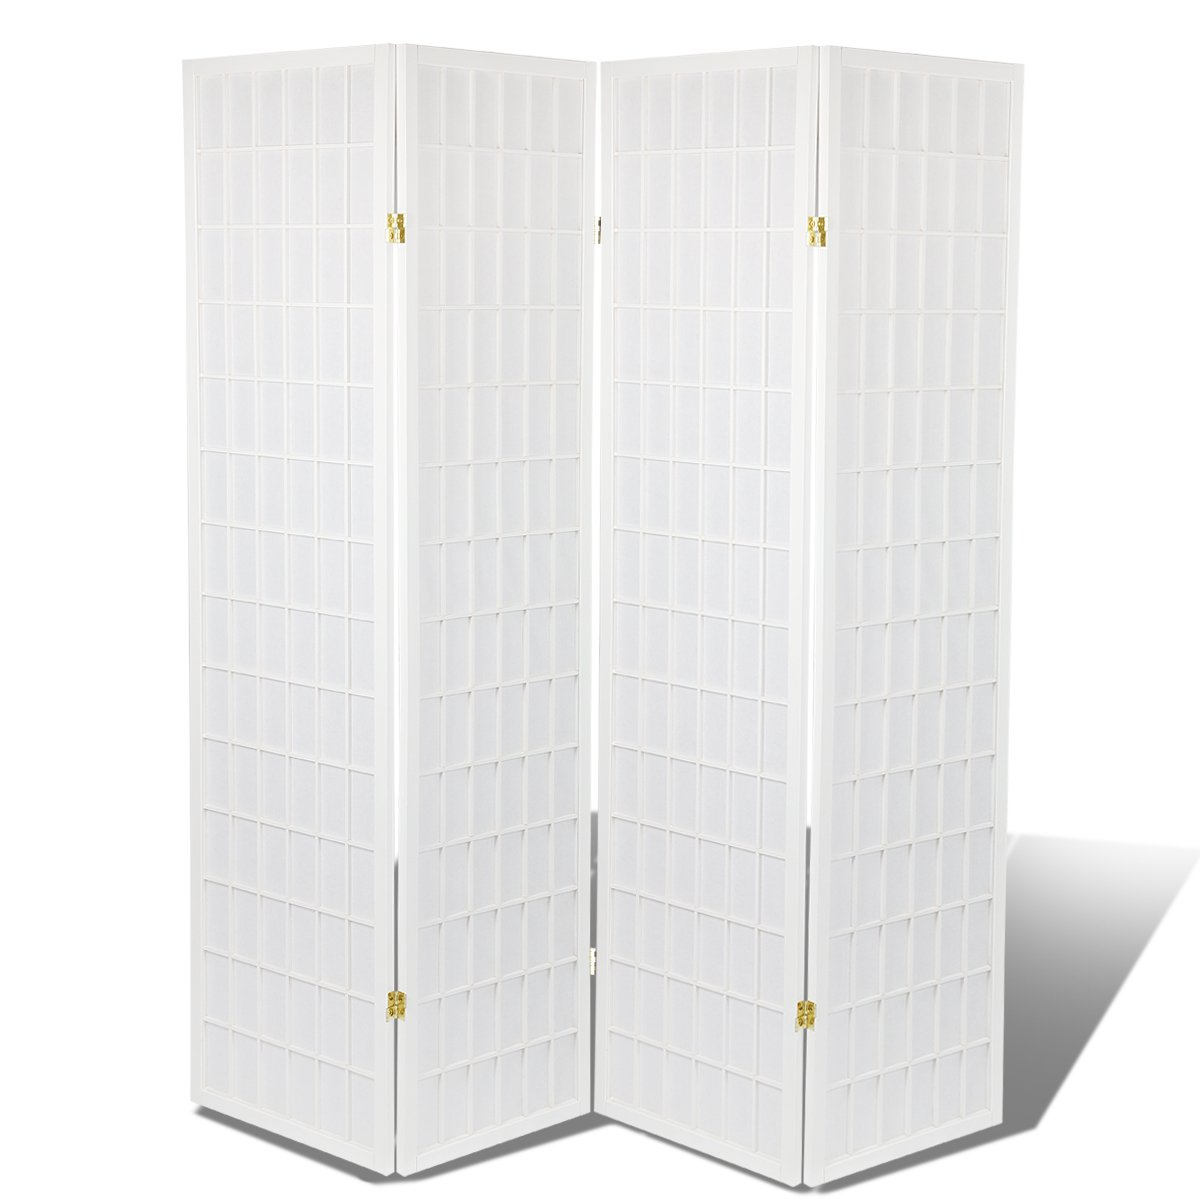 High Quality Oriental Room Divider Hardood Shoji Screen (White, 4-Panel) by Magshion Futon Furniture